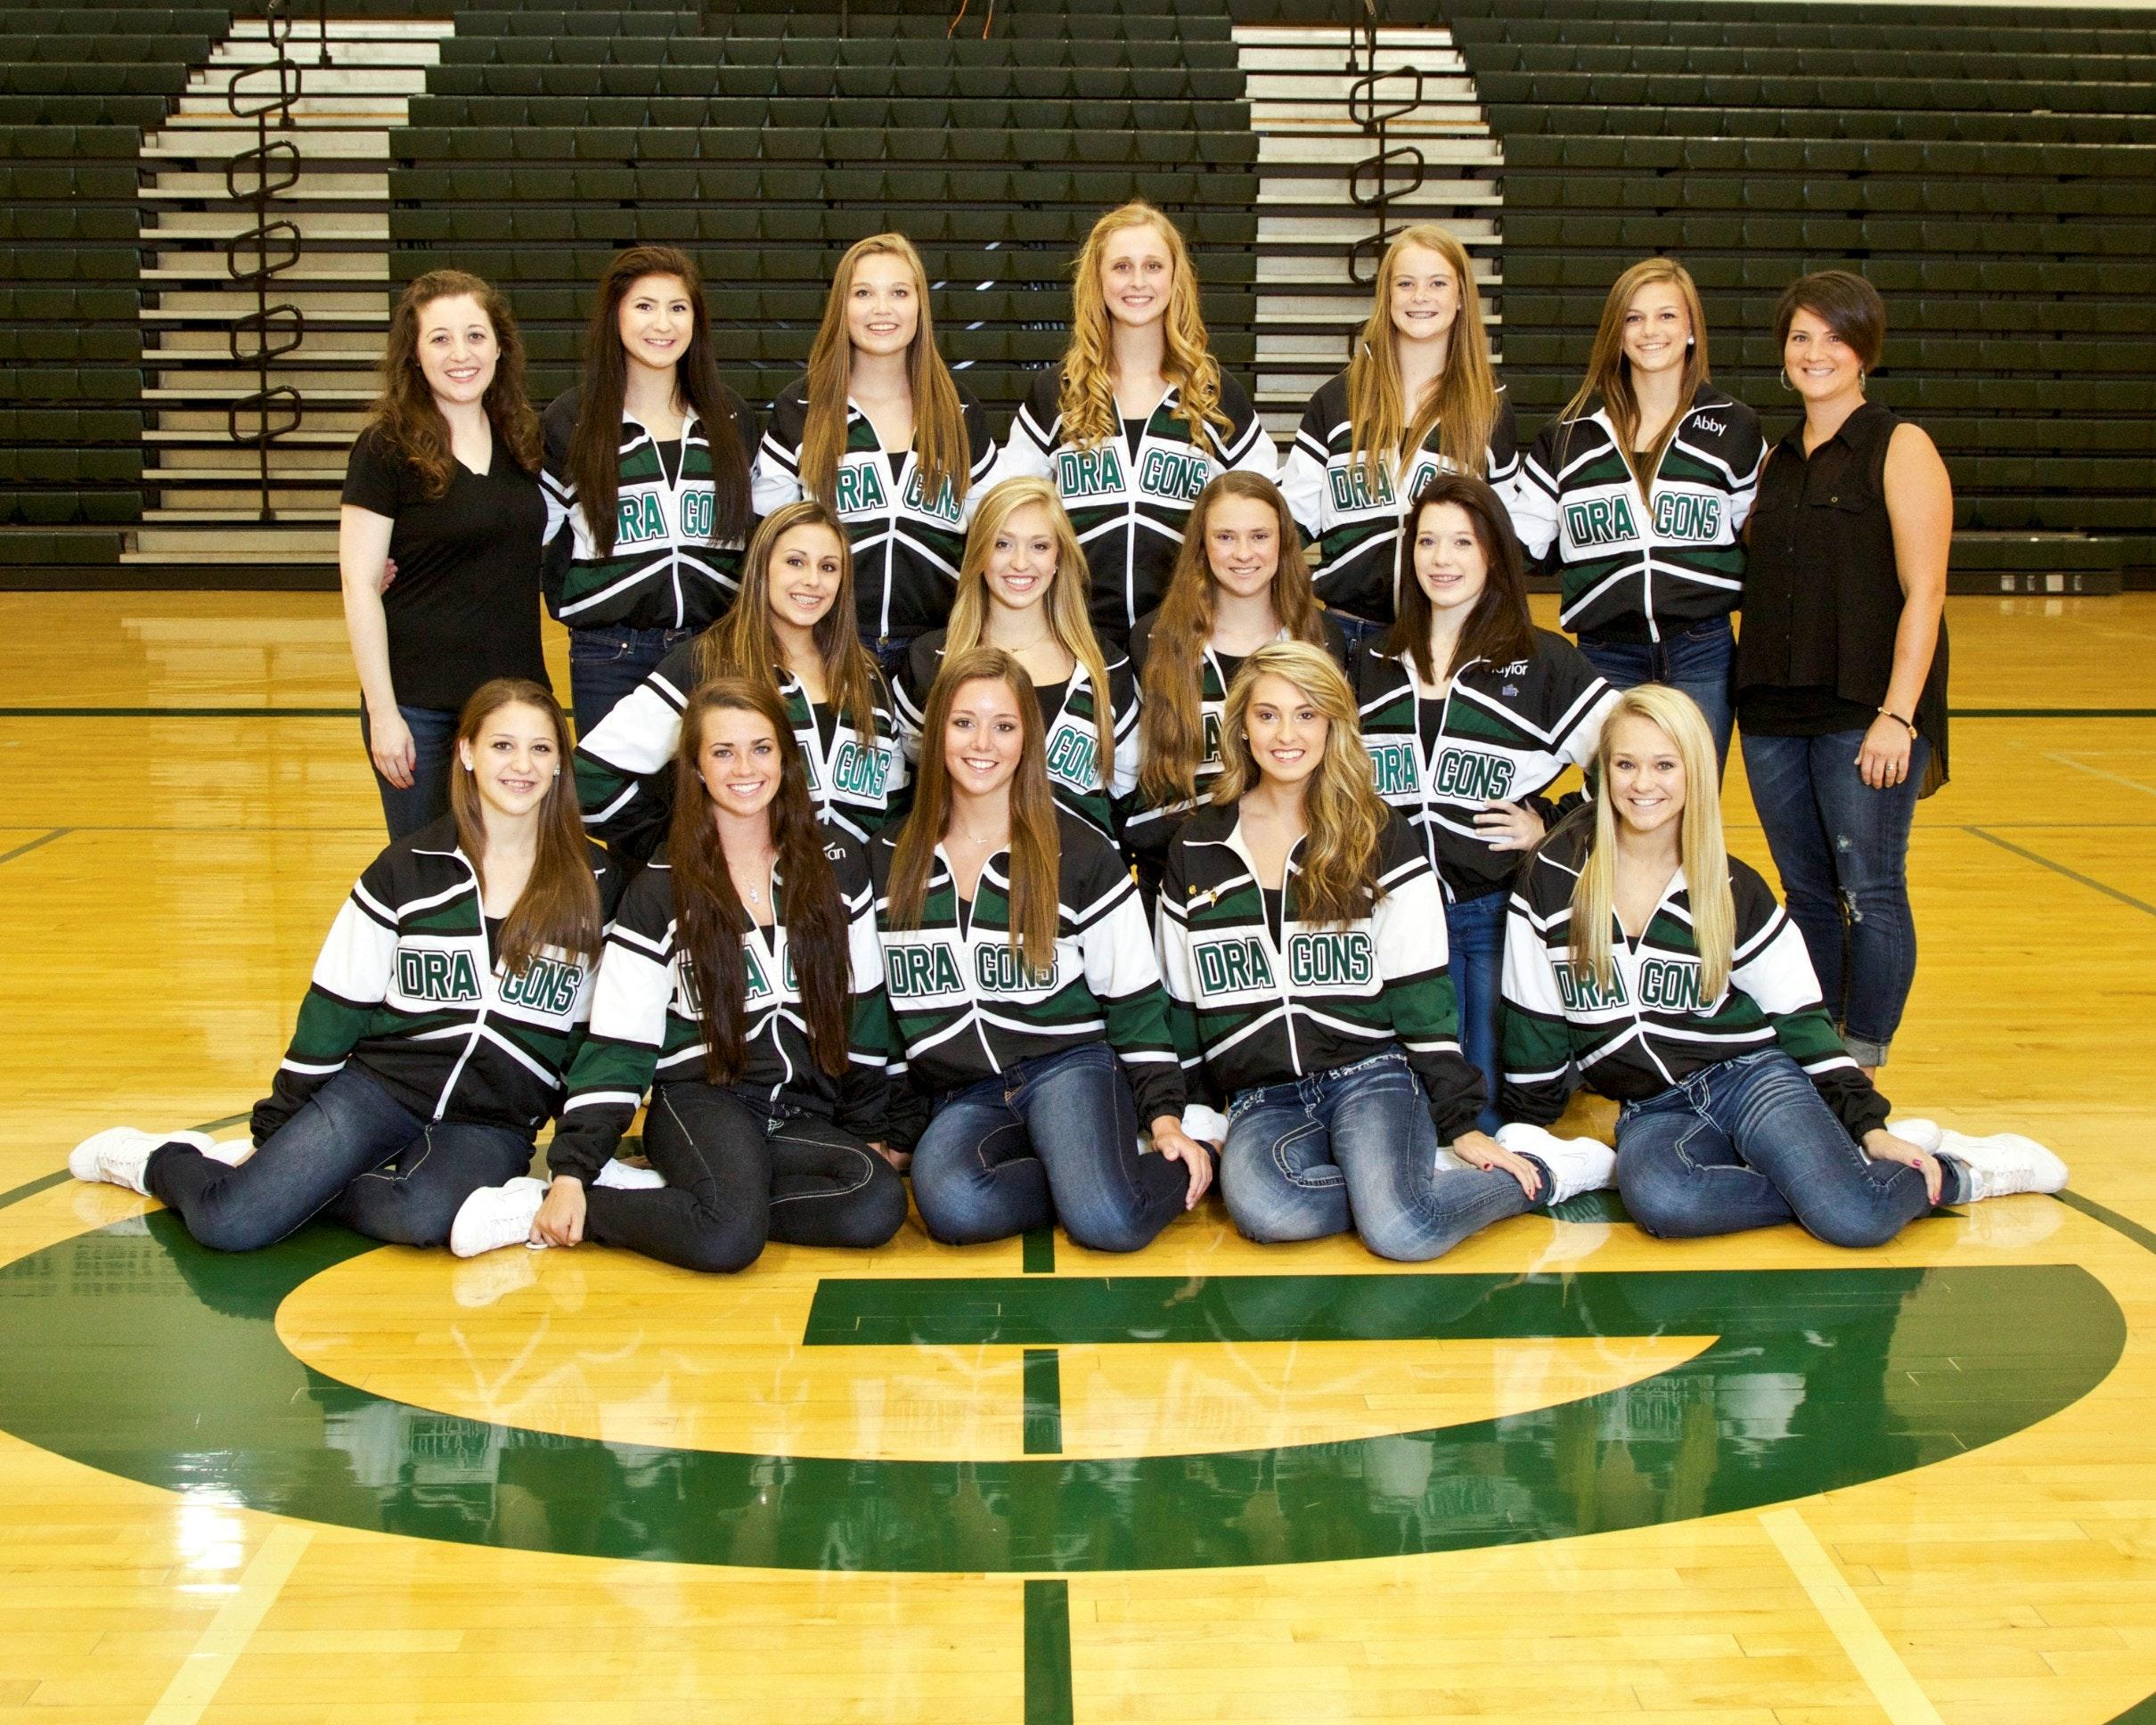 Gretna HS Dance Team